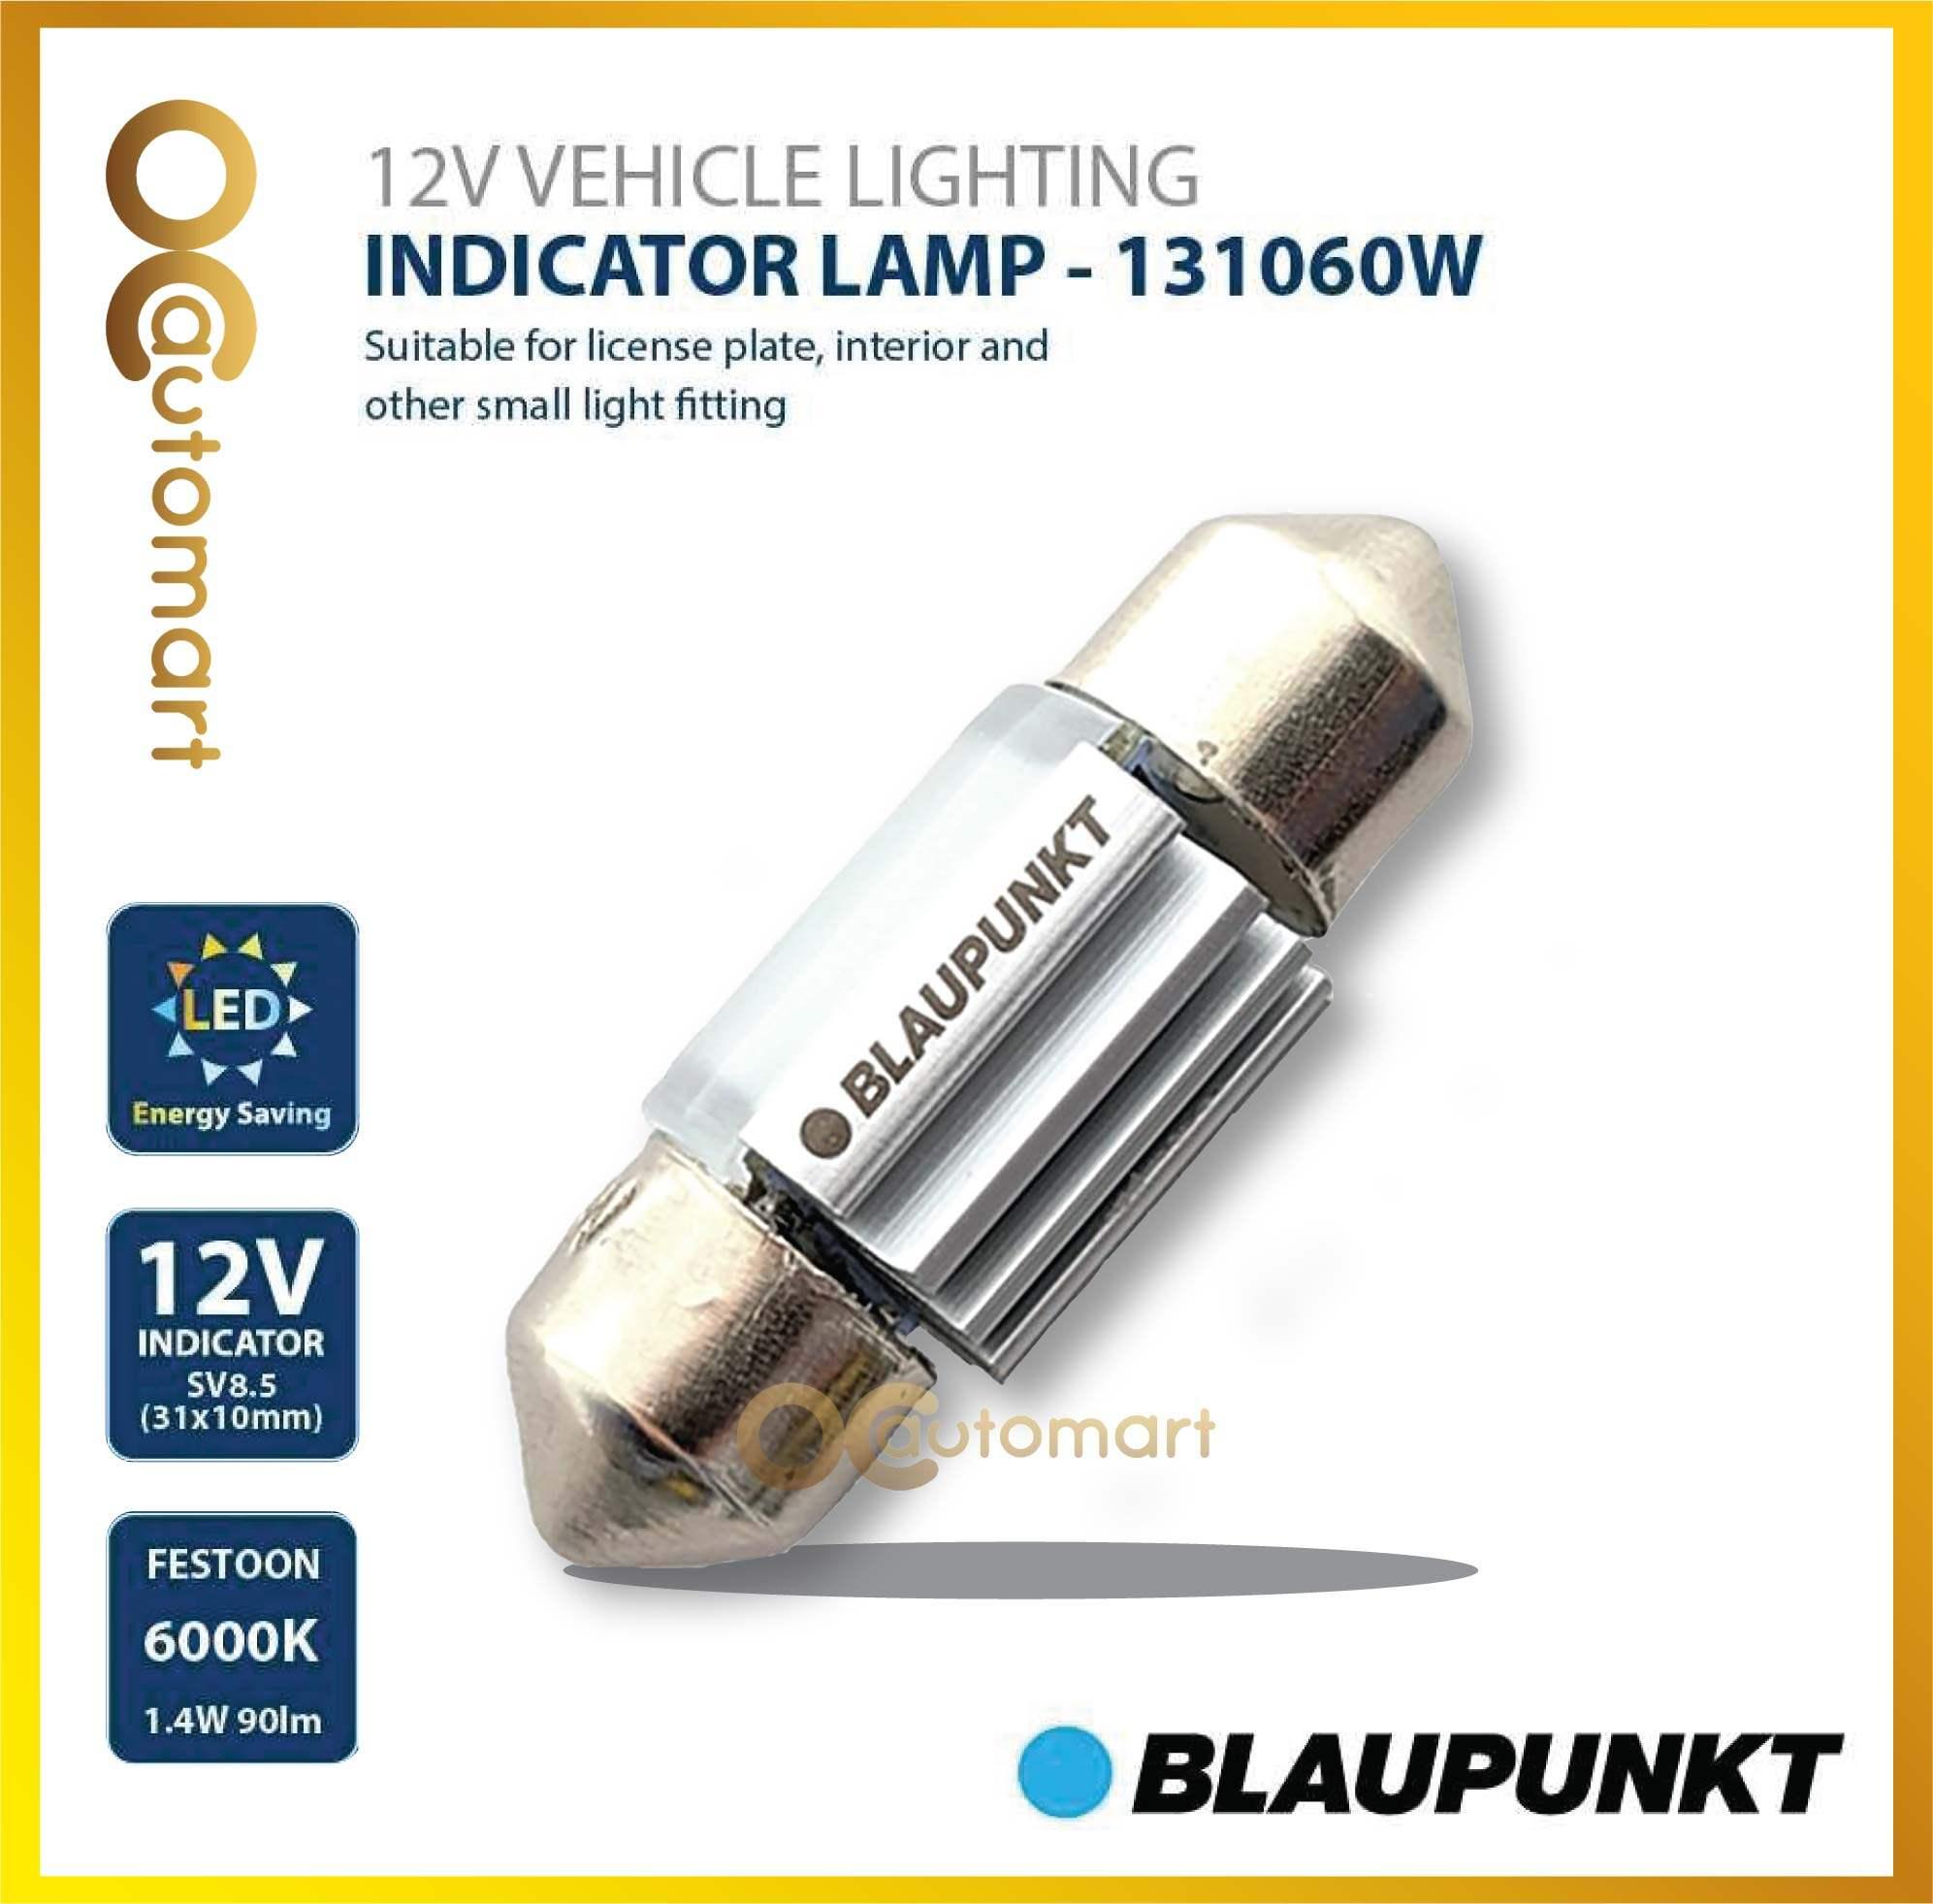 INDICATOR LAMP 131060W 12V VEHICLE LIGHTING FESTOON 6000K BULB INDOOR LAMP